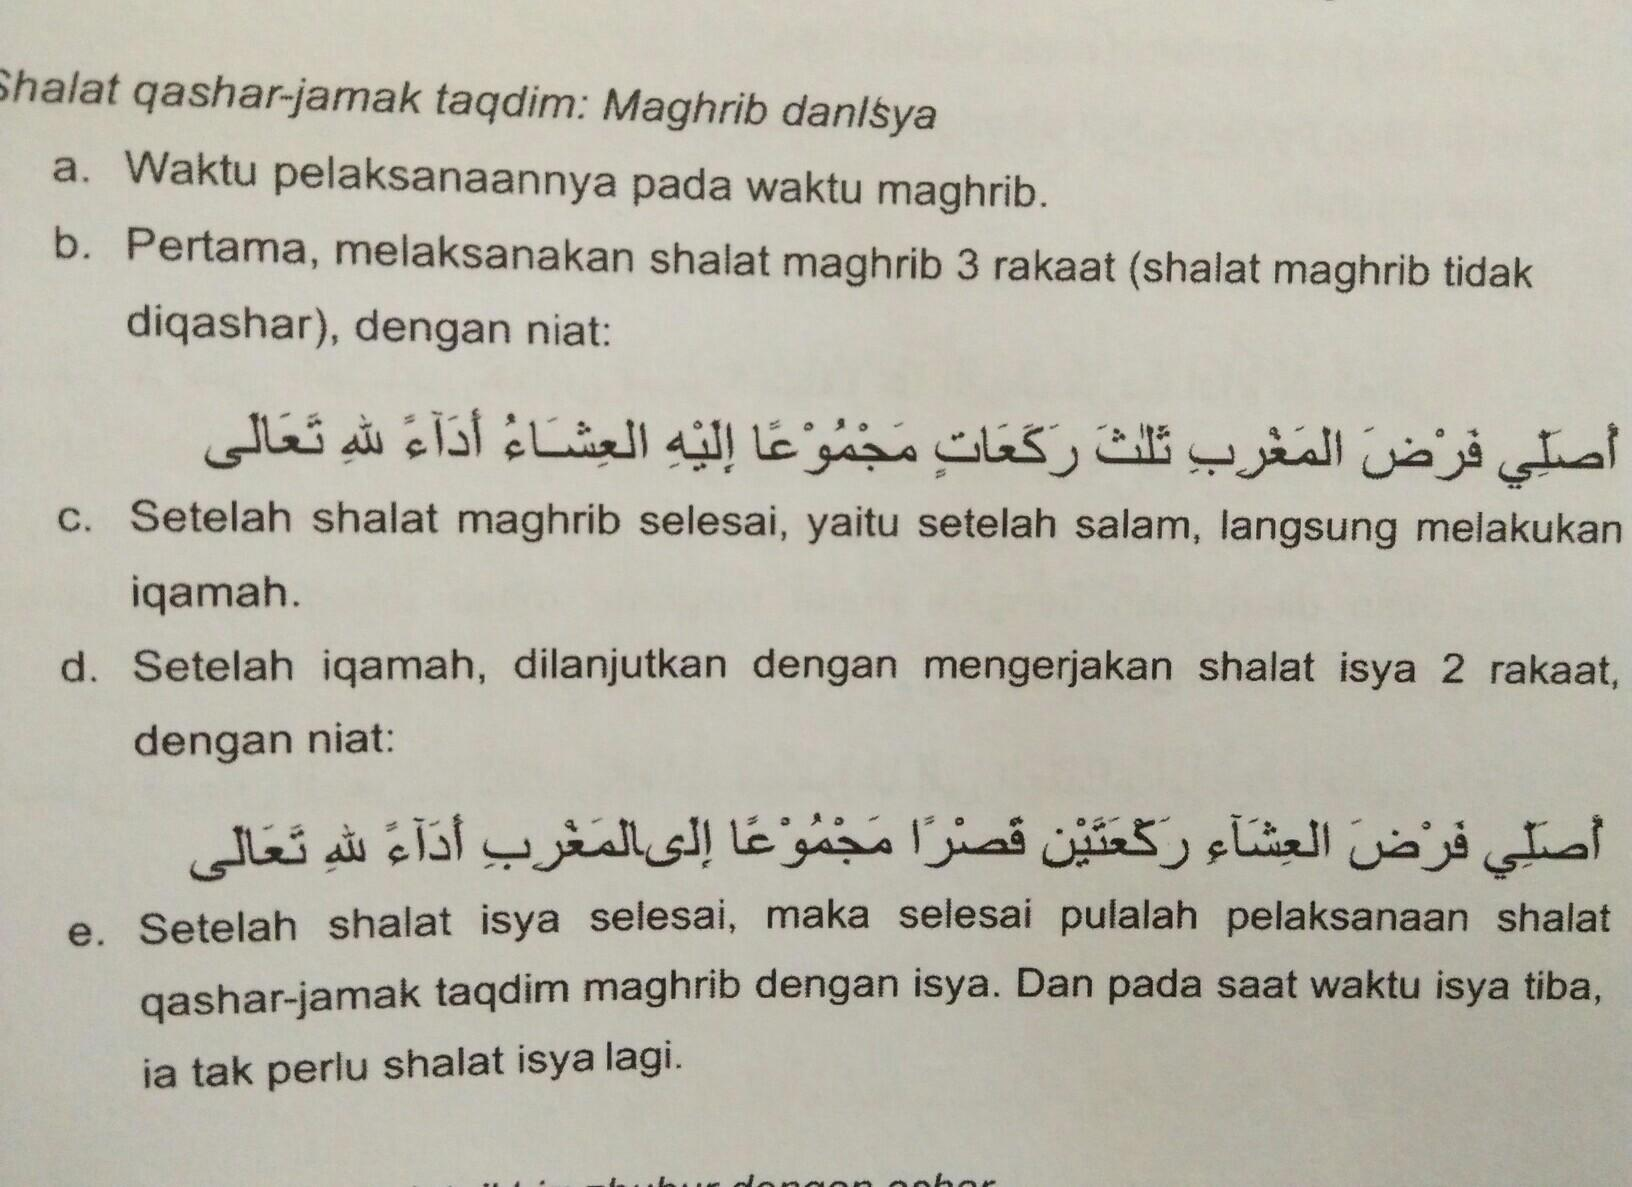 Niat Salat Jamak Taqdim Magrib Dengan Isya Brainly Co Id